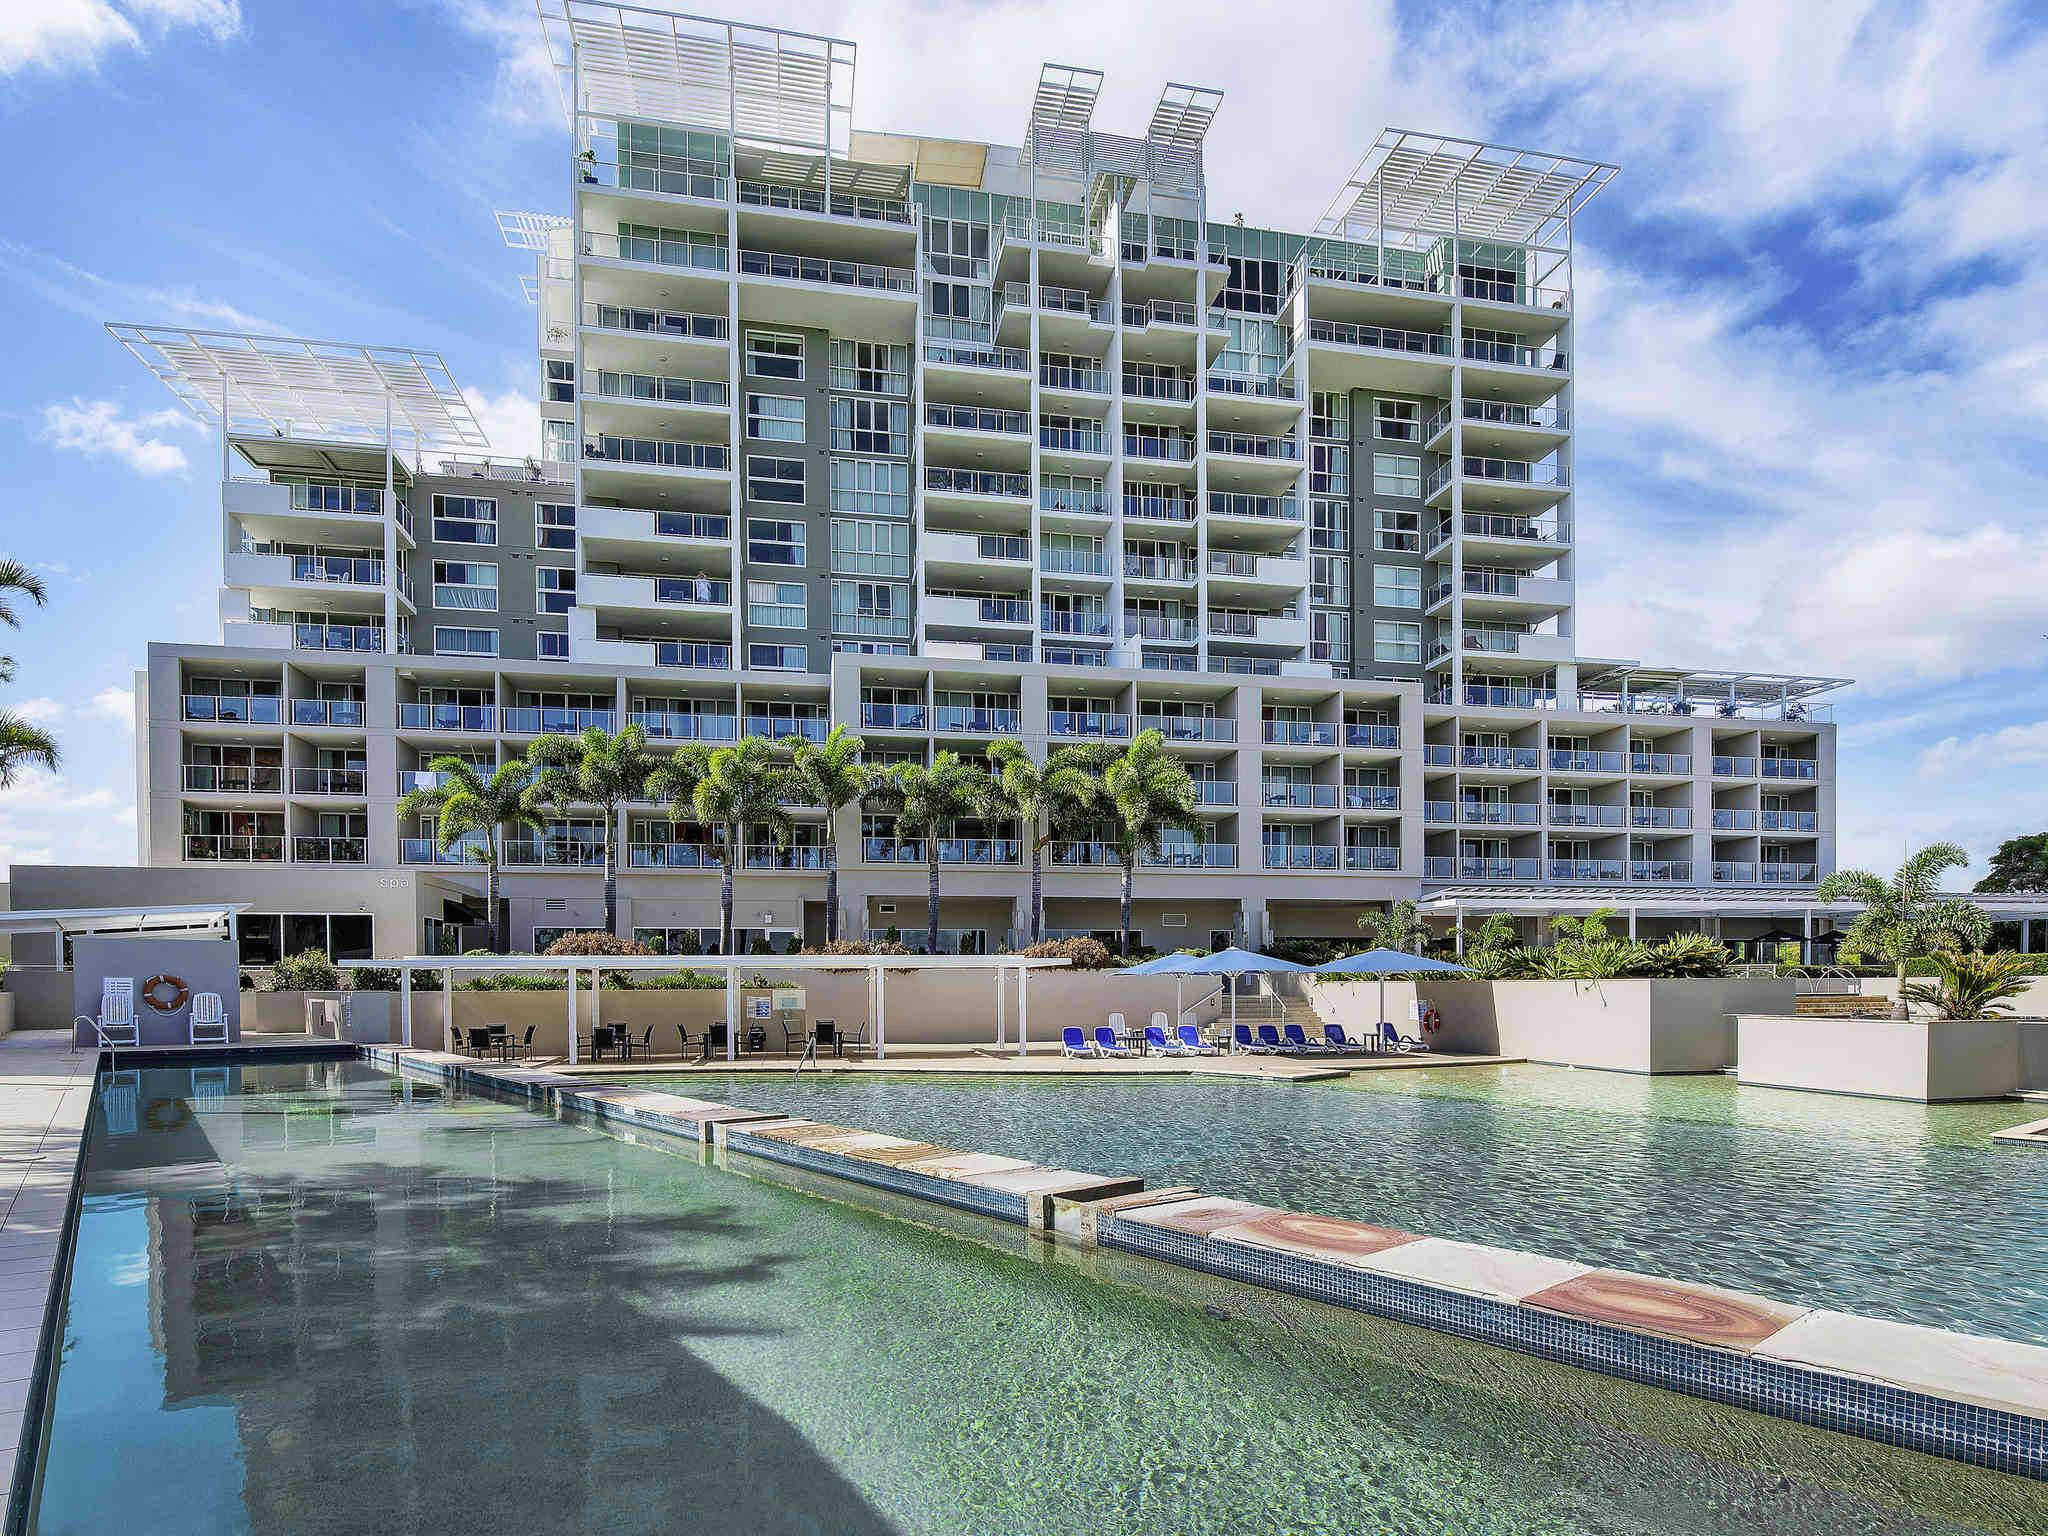 Hotel - The Sebel Pelican Waters Resort